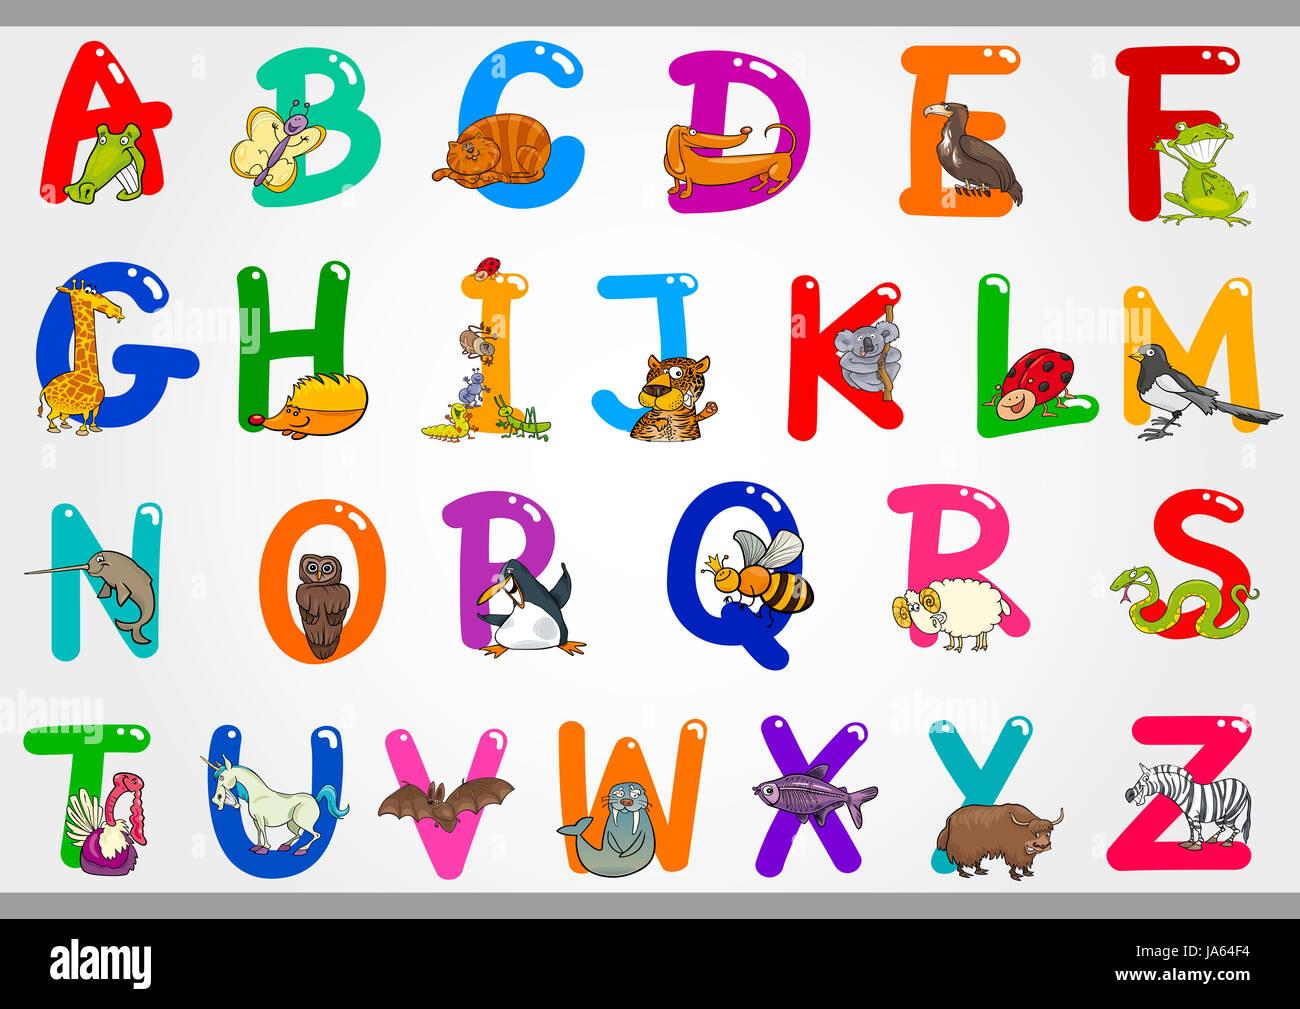 Bildung, Illustration, Alphabet, cartoon, ABC, lernen, Kind ...